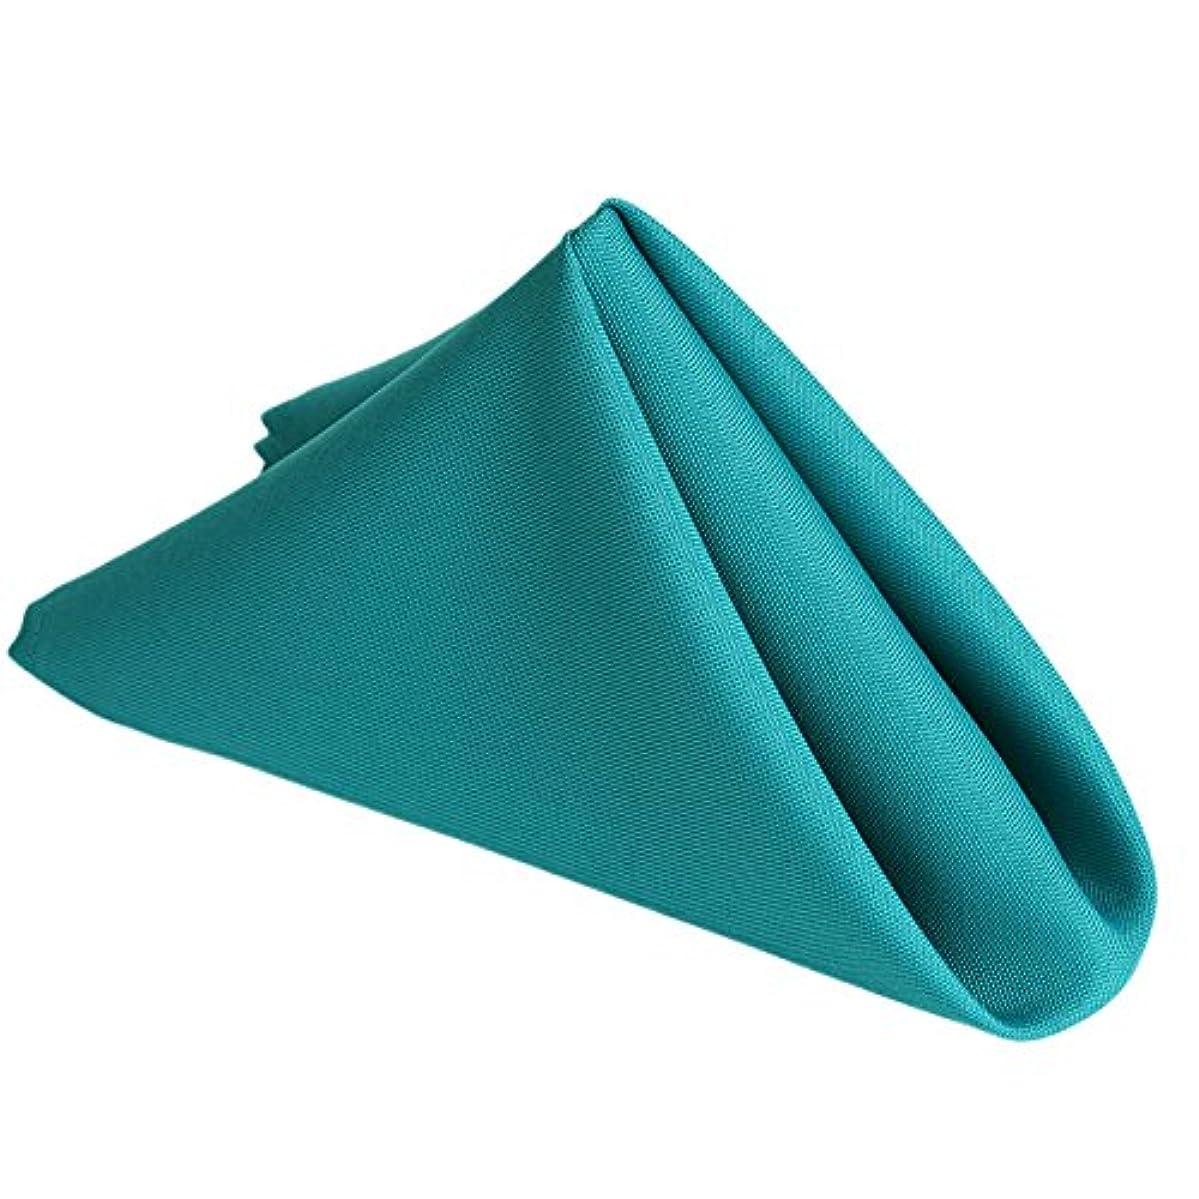 Efavormart Pack of 25 Turquoise Premium 17